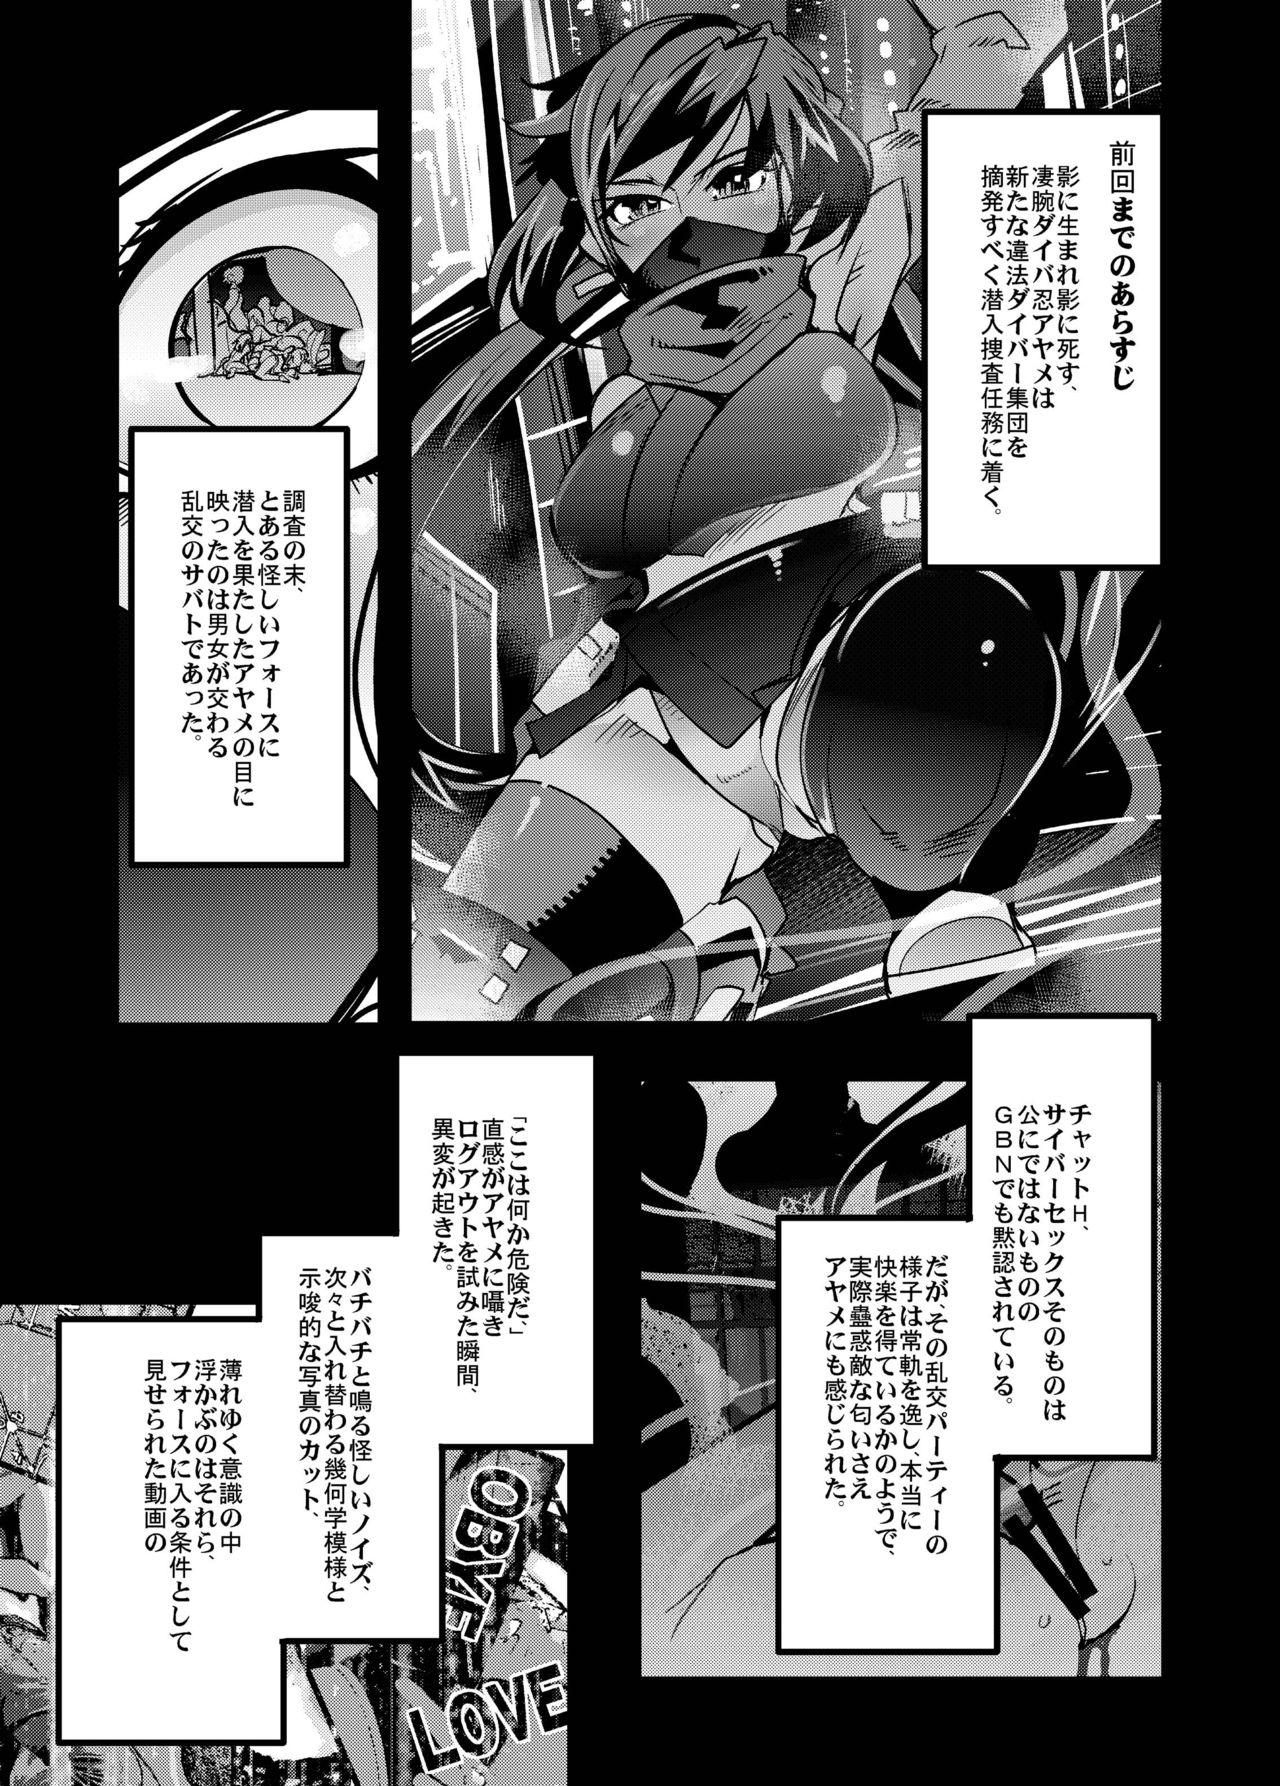 [Bronco Hitoritabi (Uchi-Uchi Keyaki)] Diver-nin Ayame to Ecchi na Mokeiya no Onee-san (Gundam Build Divers) [Digital] 4